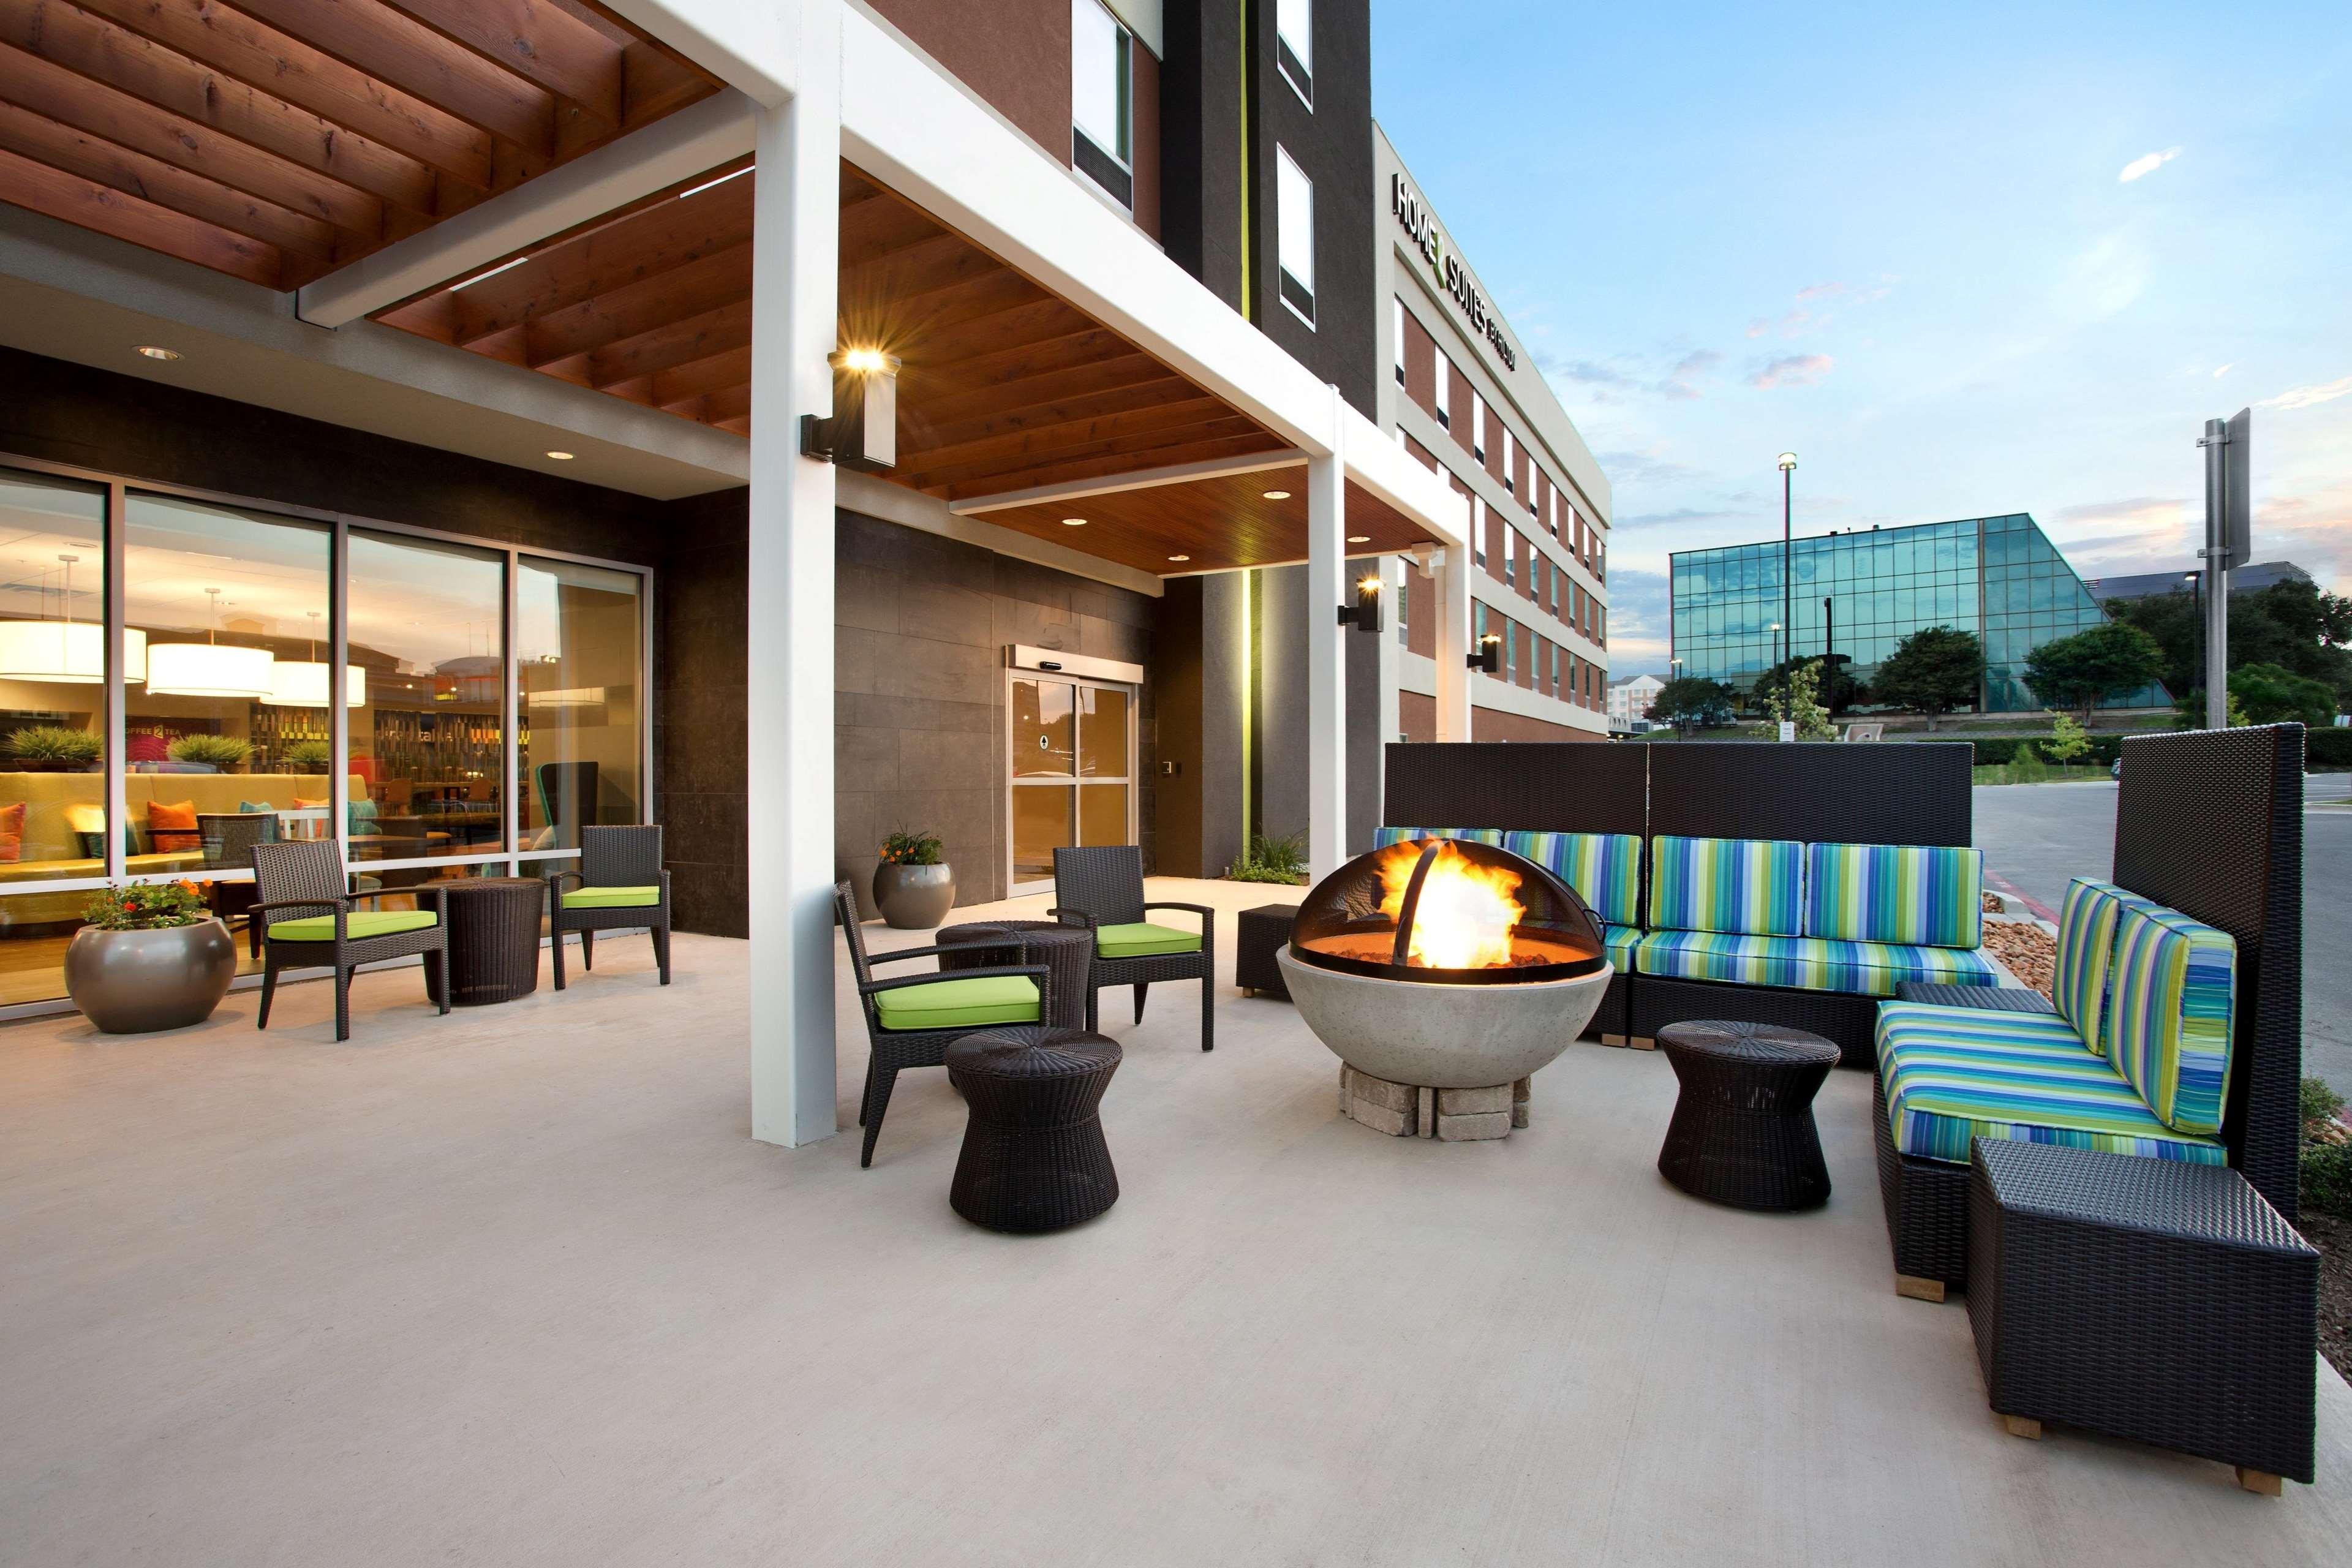 Home2 Suites by Hilton San Antonio Airport, TX image 28